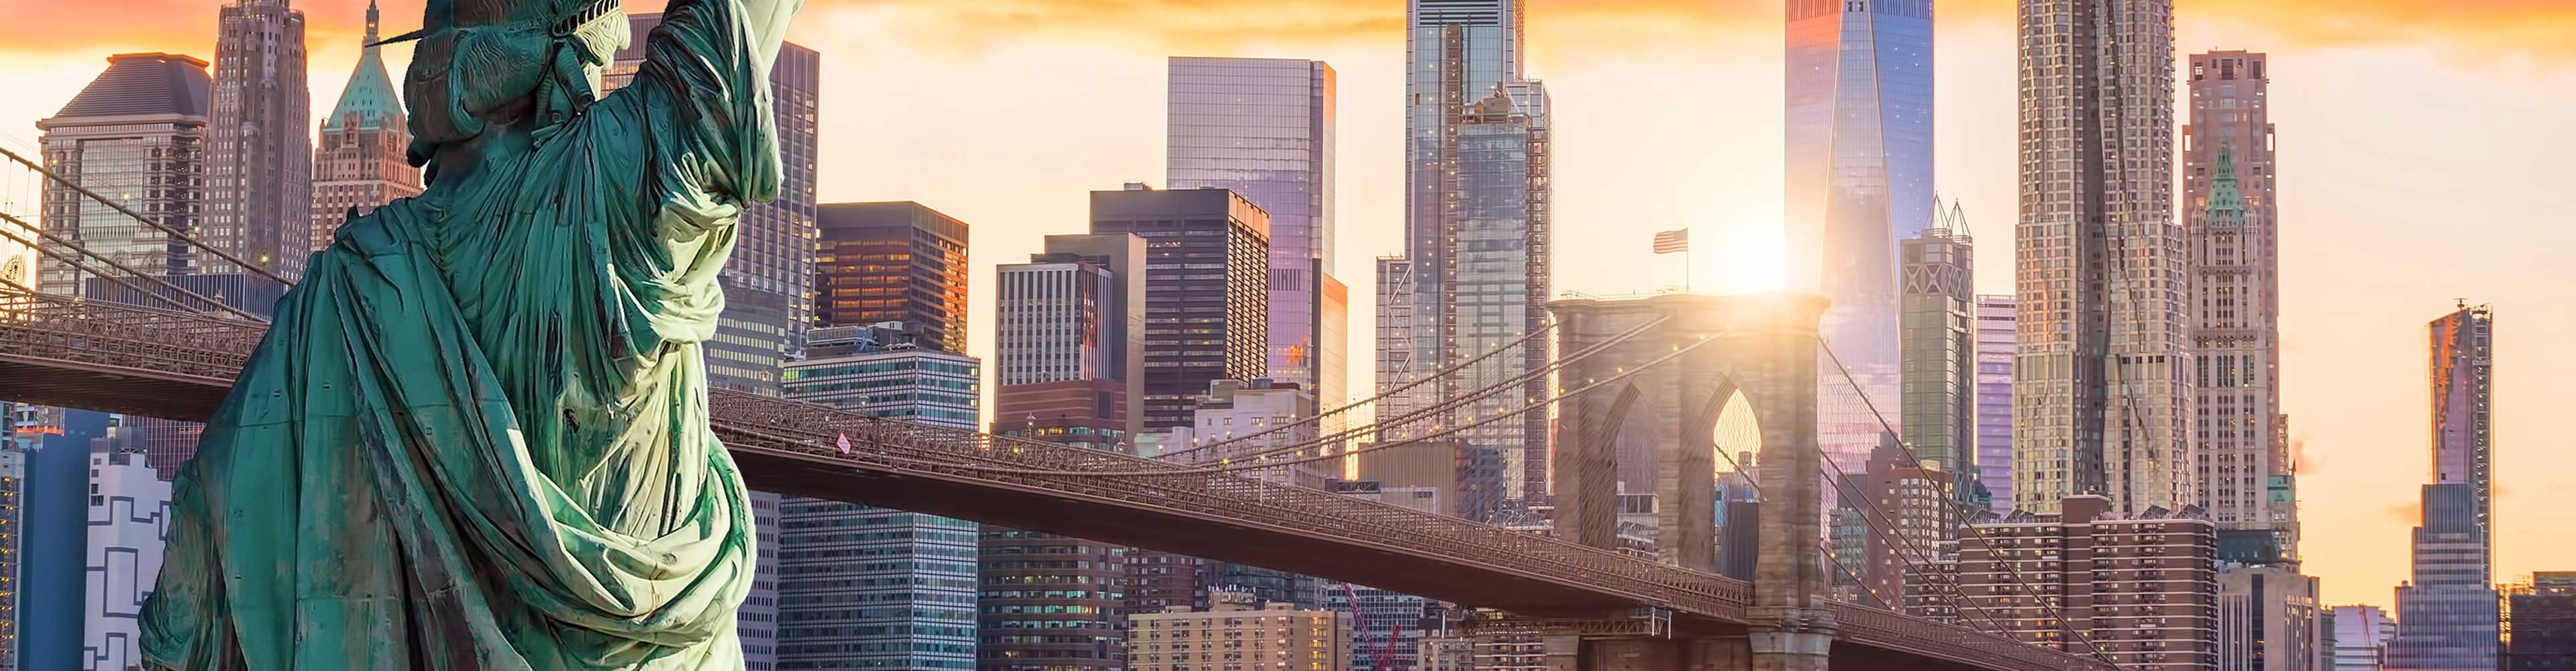 Tours de Nueva York